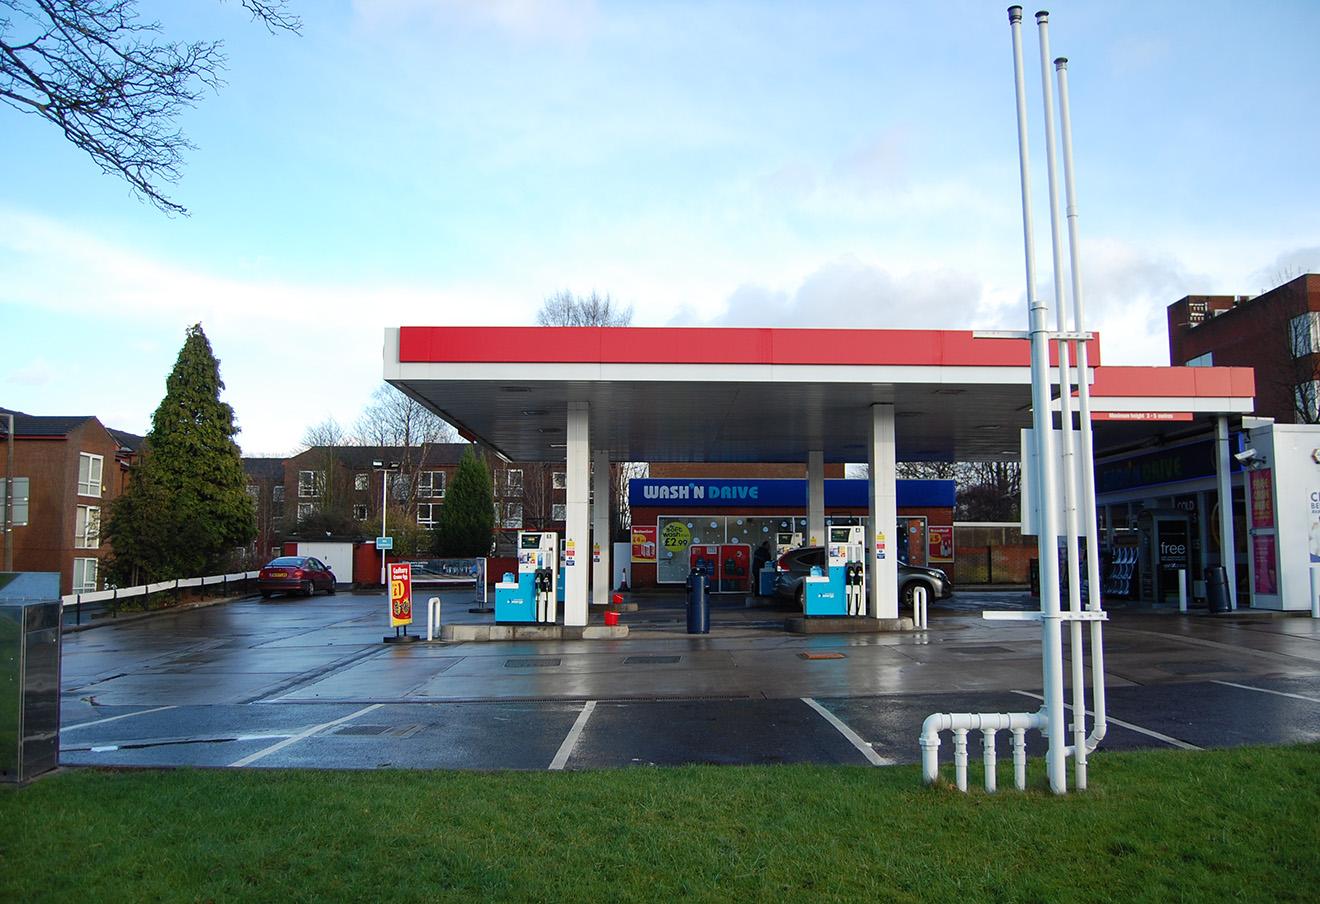 Заправка Esso (Standard Oil) в Манчестере.